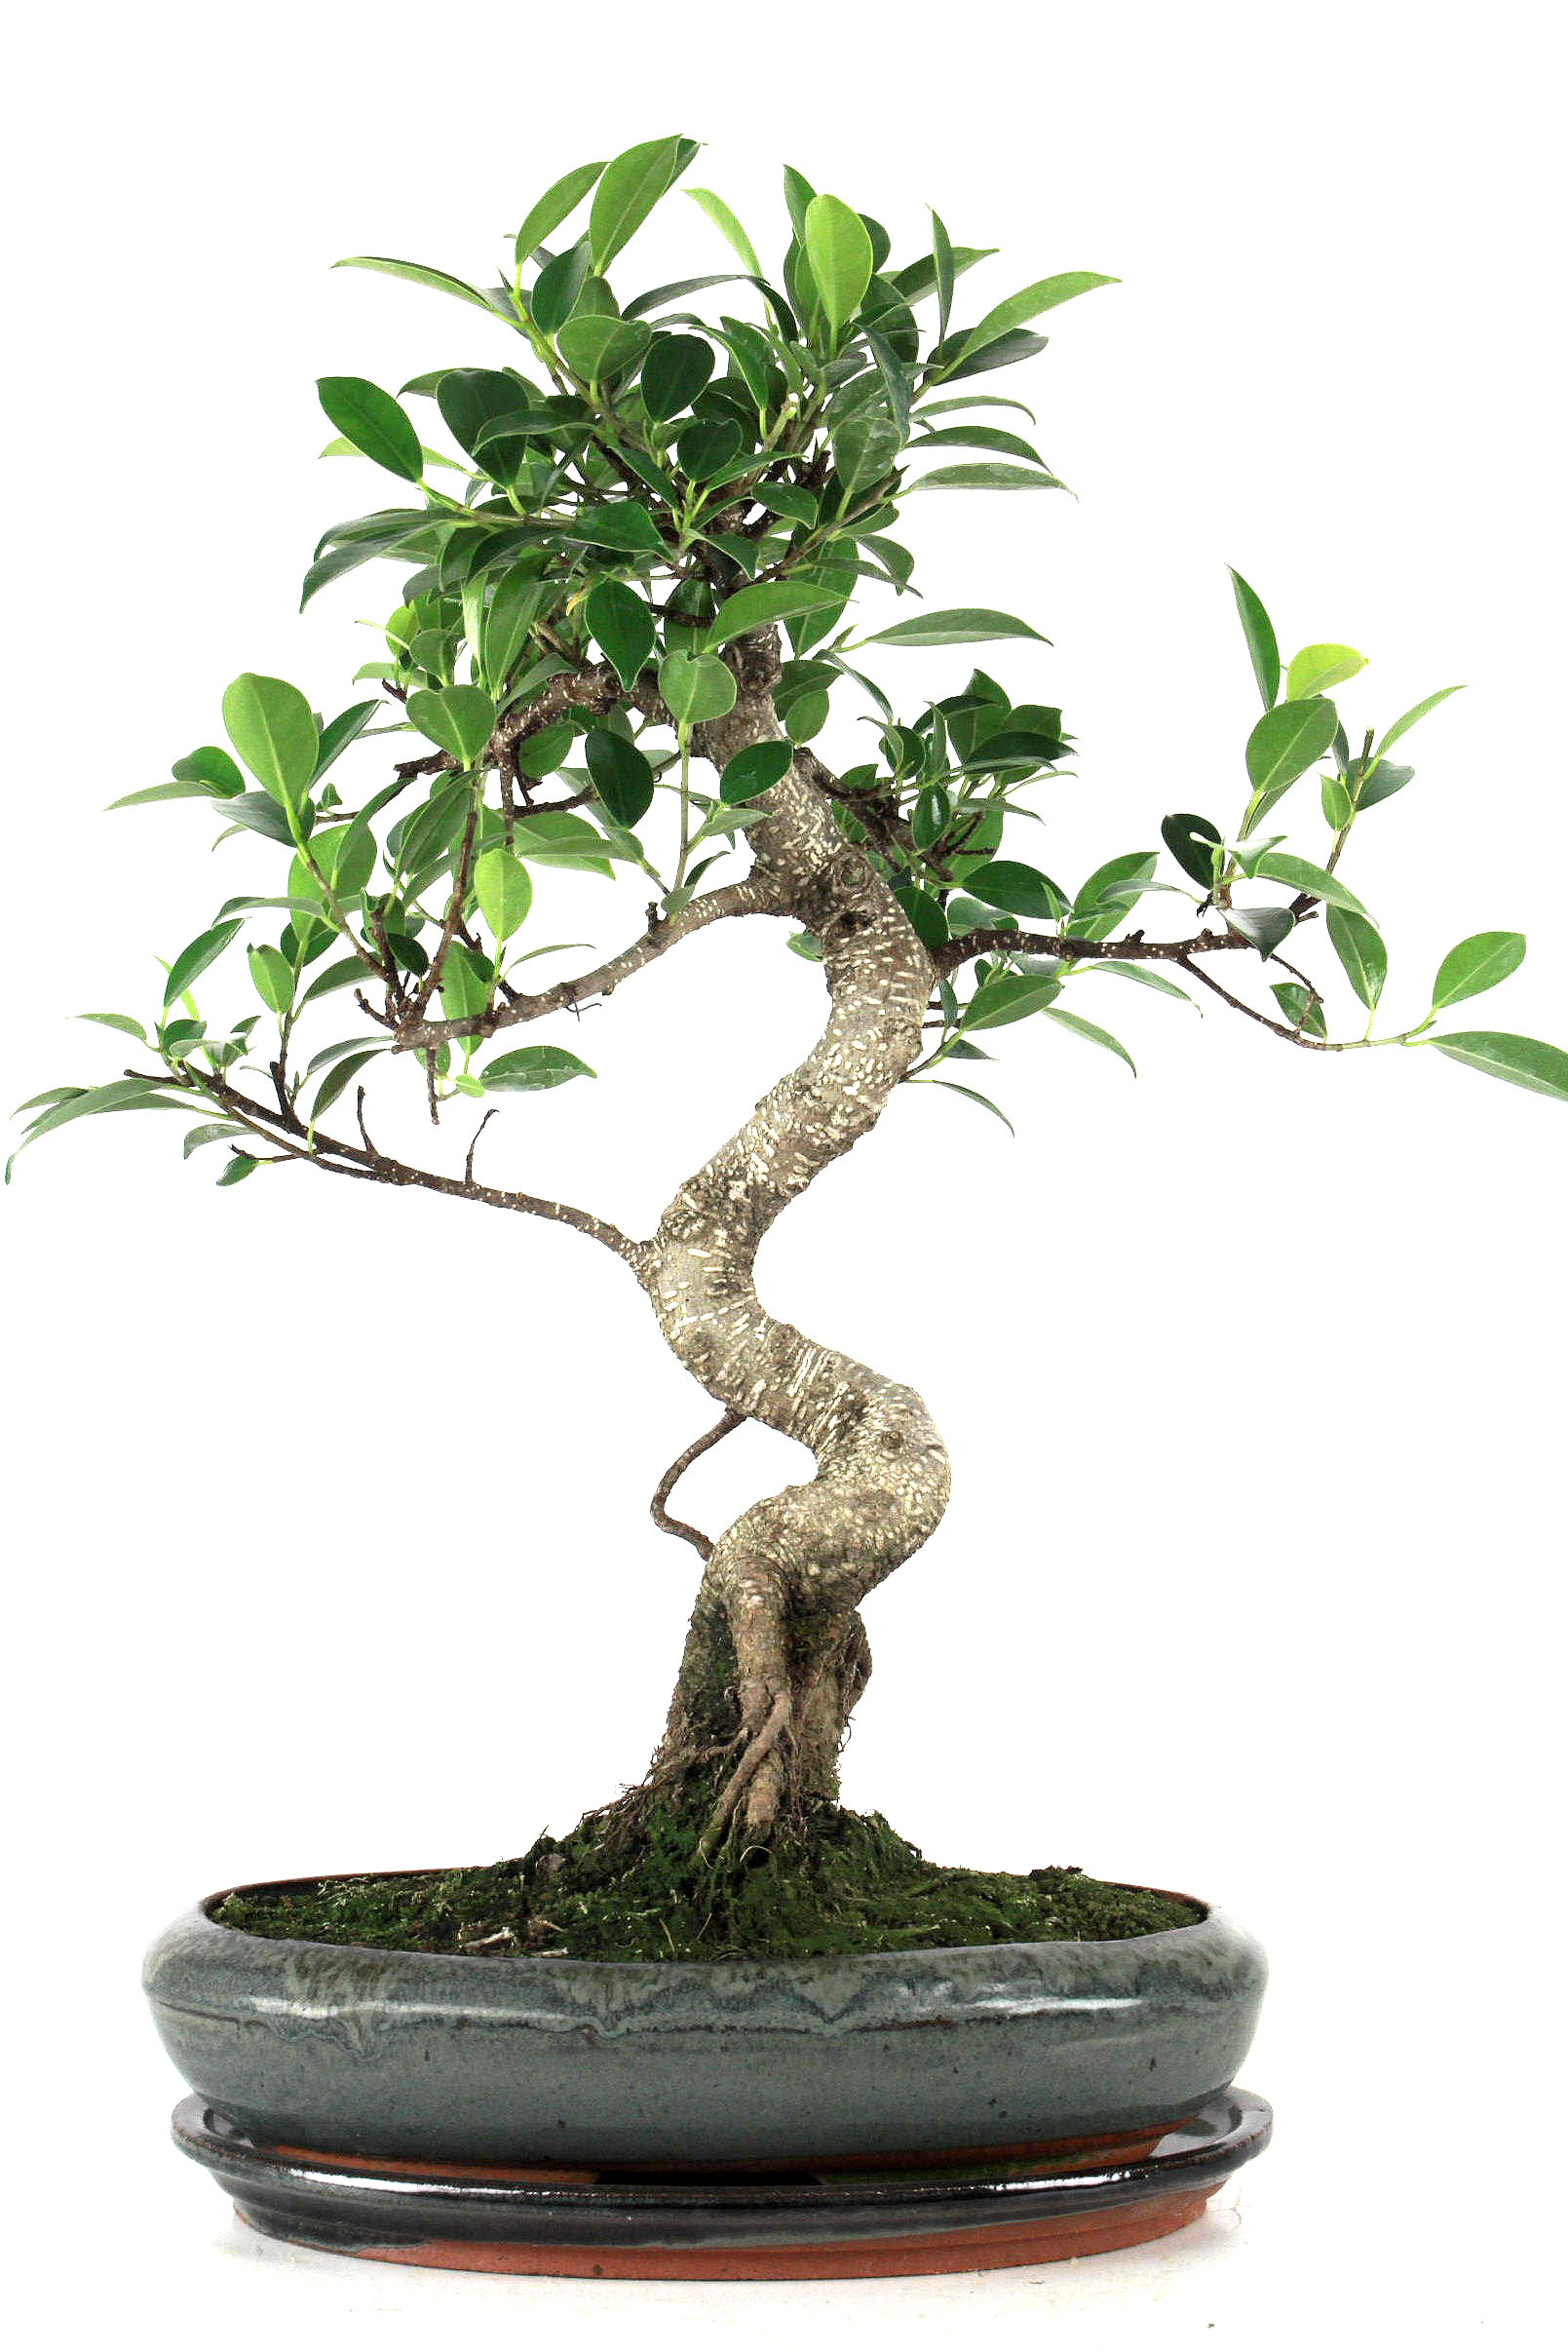 ficus retusa 35 40 cm 234 bei oyaki bonsai kaufen. Black Bedroom Furniture Sets. Home Design Ideas